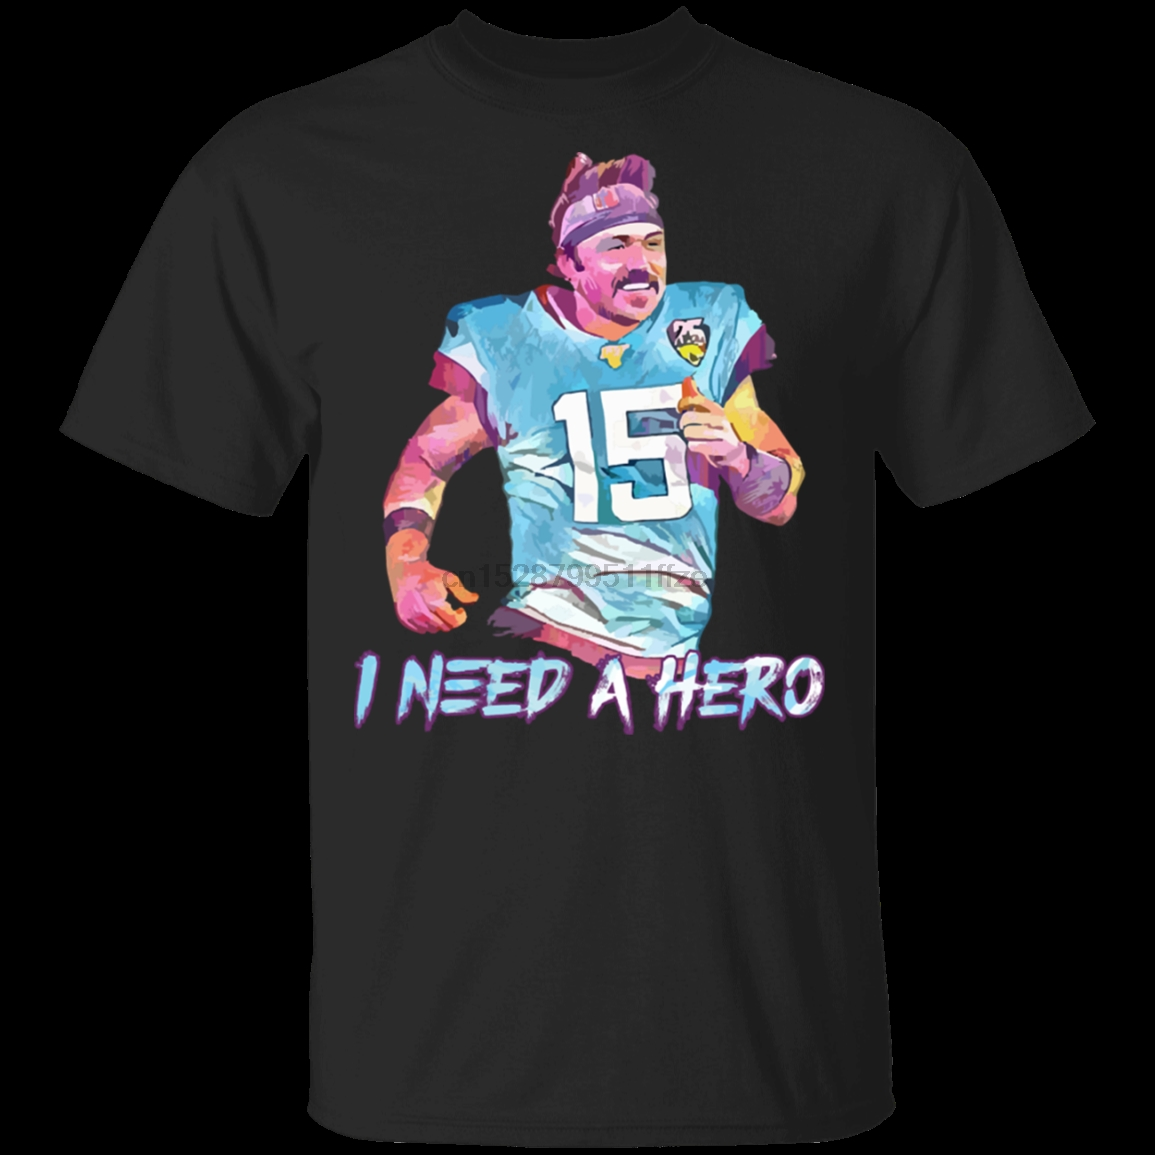 Men/'s Gardner Minshew I Need A Hero Short Sleeve Black T-Shirt S-5XL